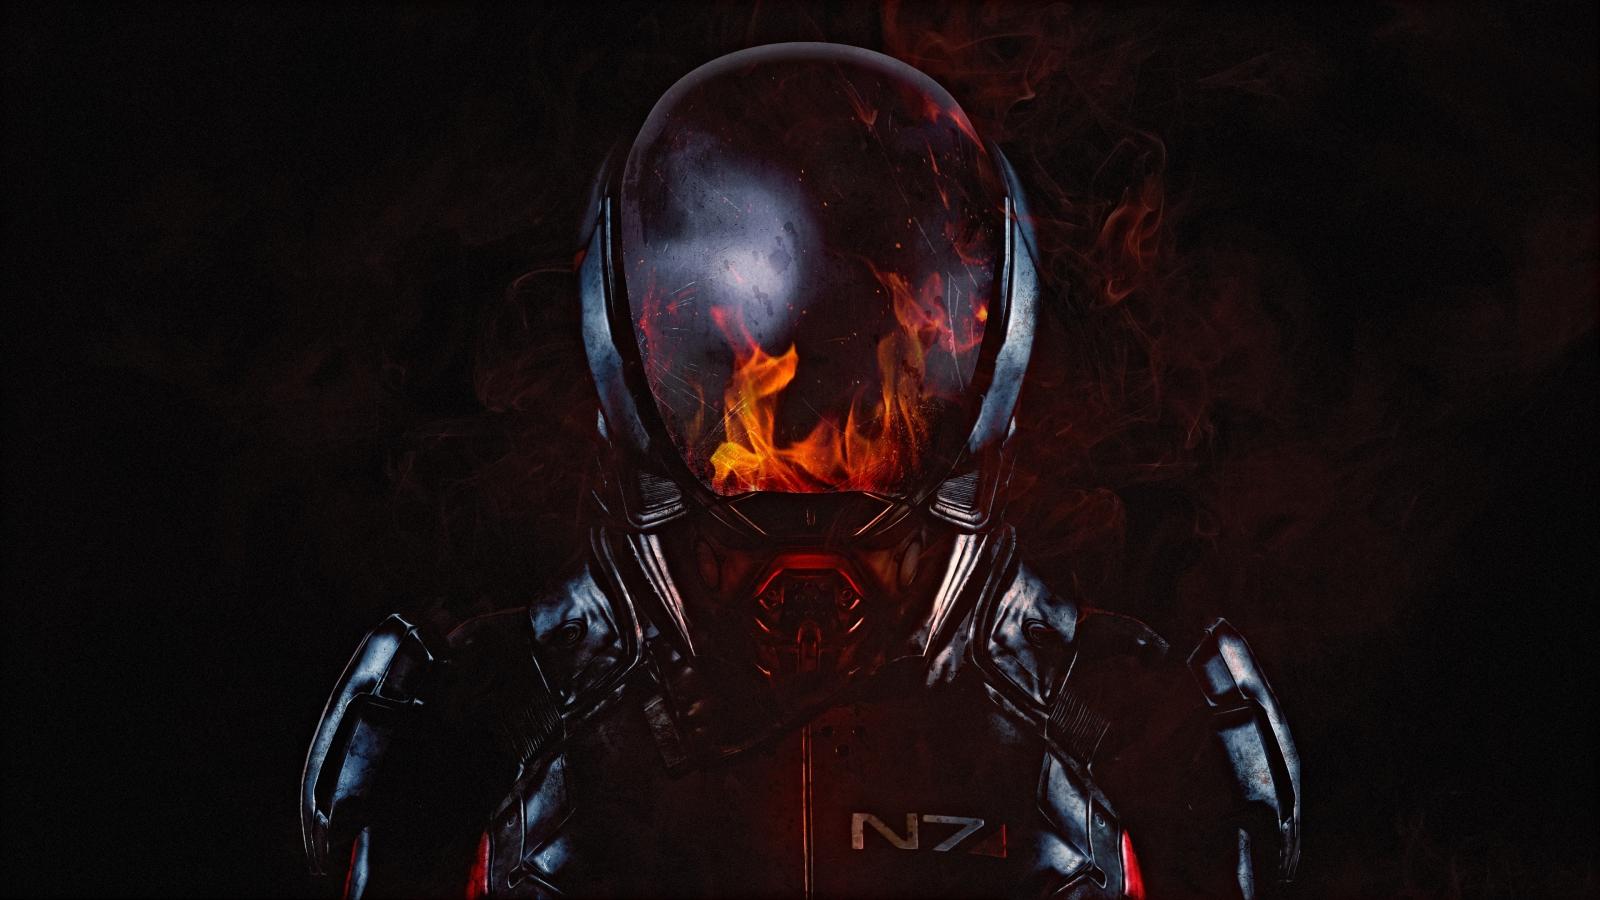 N7 armor 3840x2160 mass effect andromeda 4k 10315